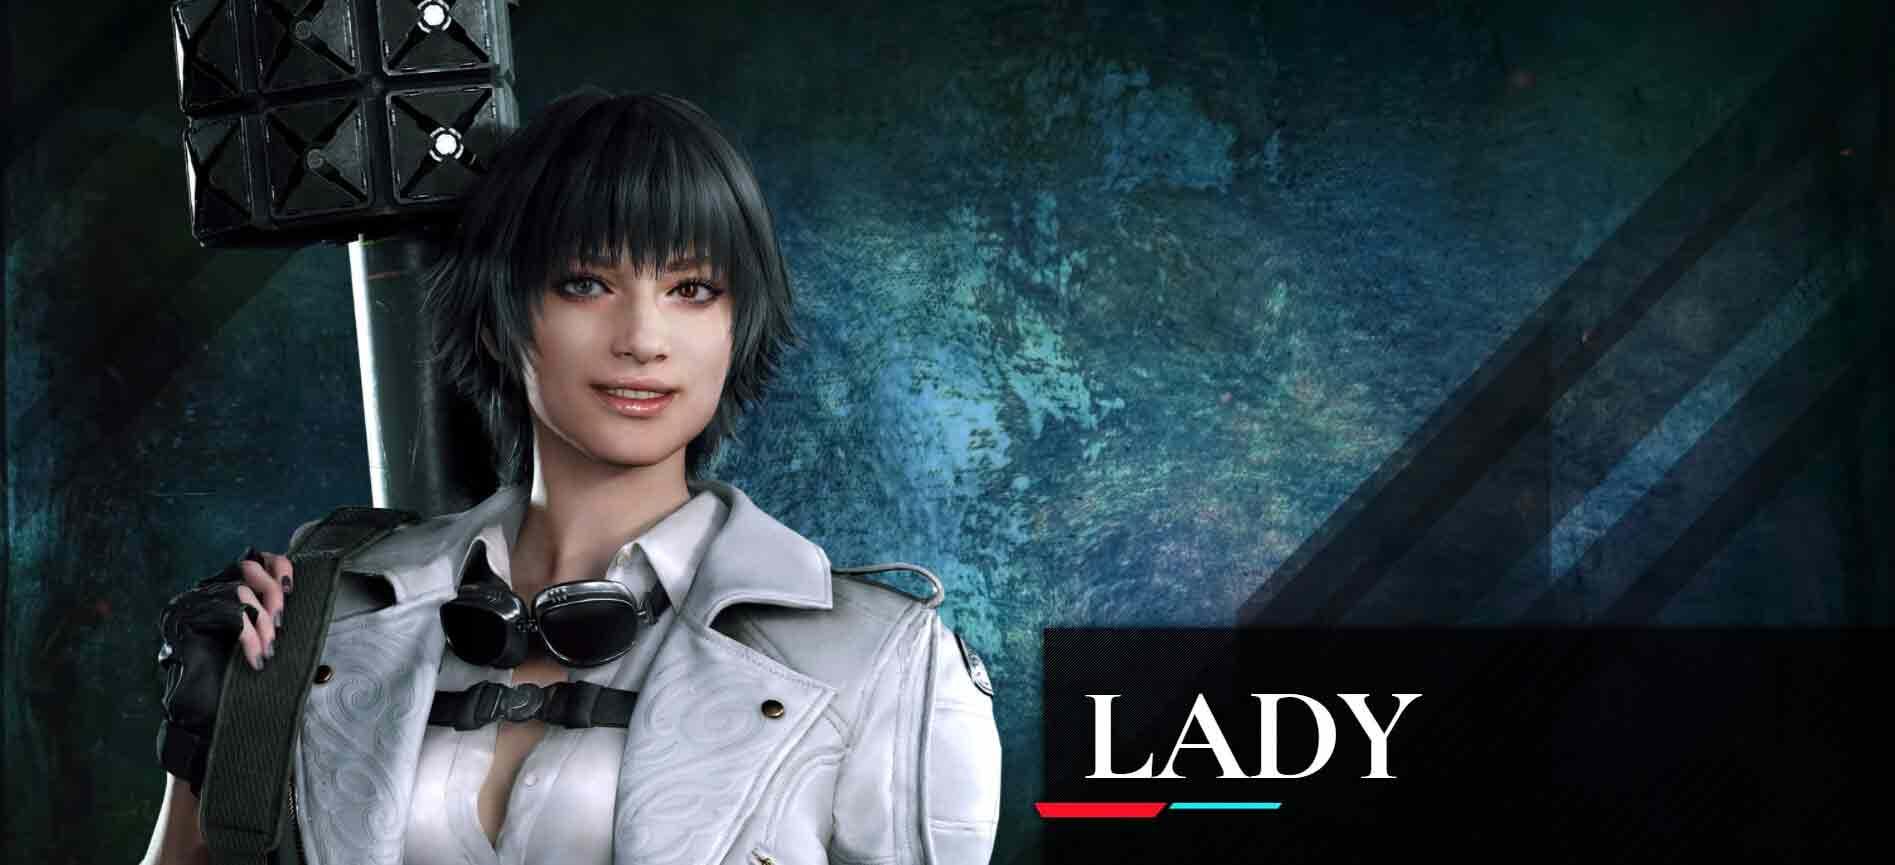 Lady-Devil-May-Cry-แมรี่แอน-สวยสังหาร